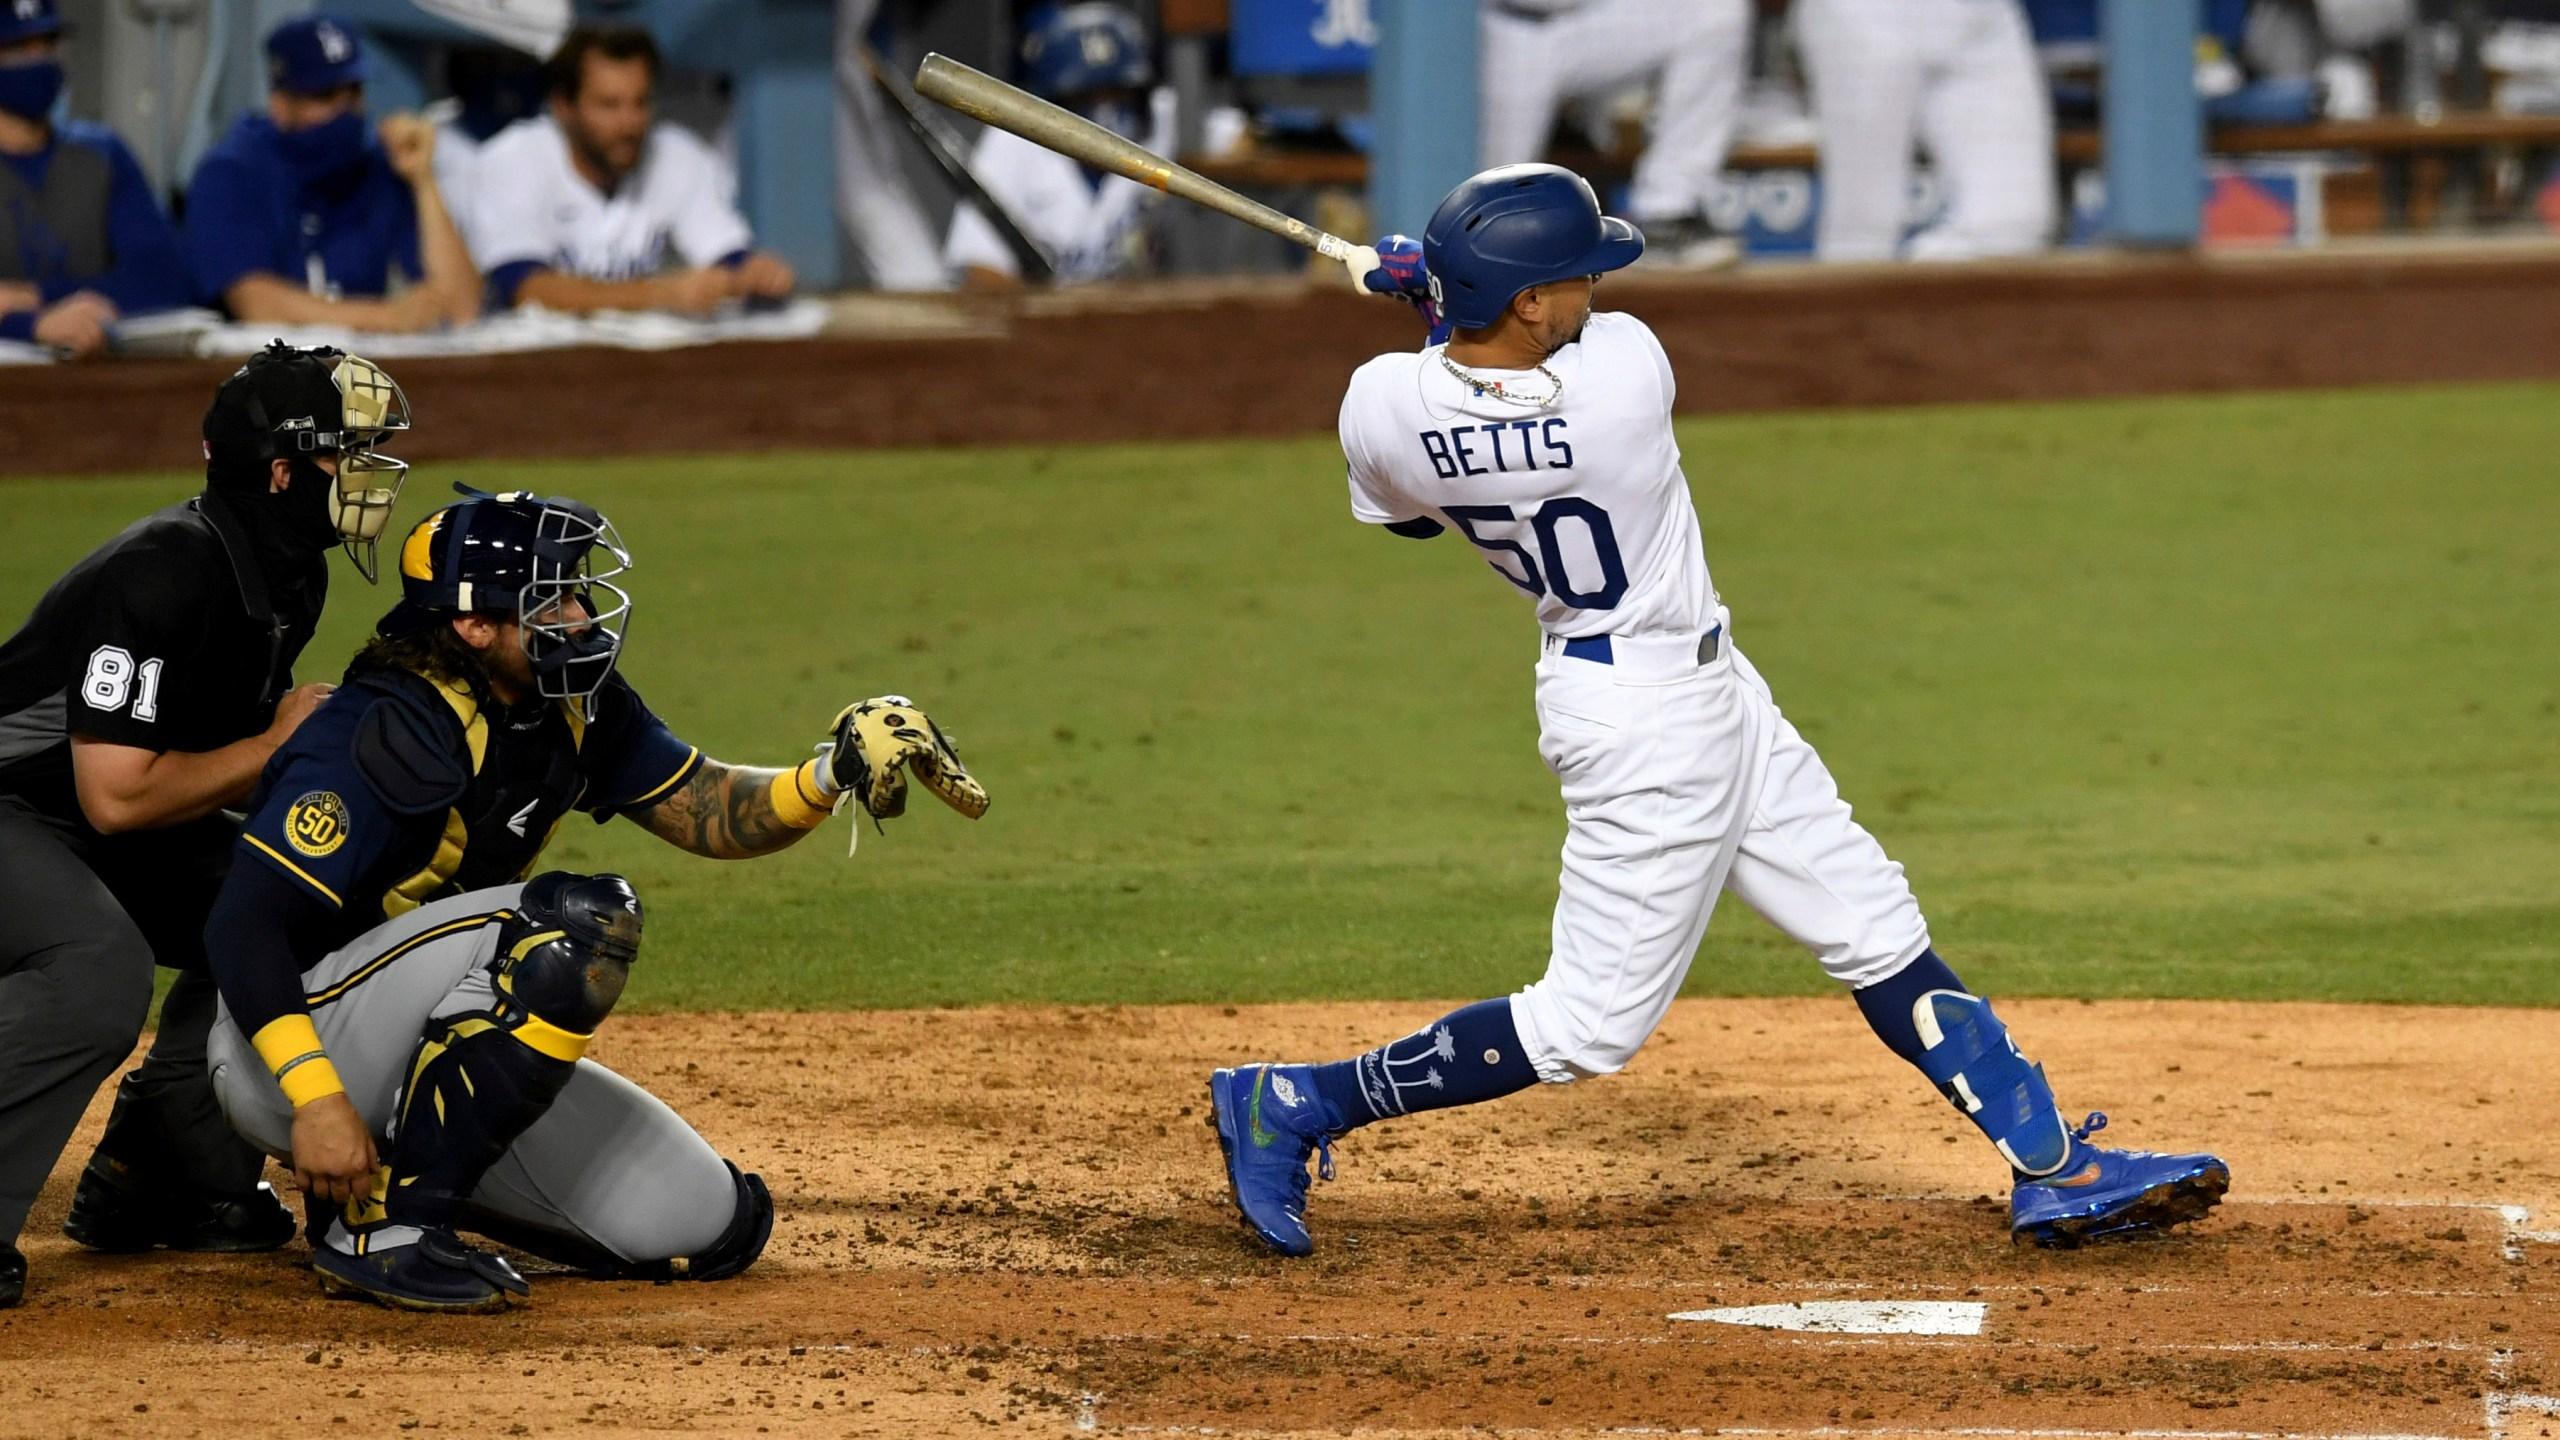 Walk In New Park Dodgers Open Nlds With 5 1 Win Over Padres Arklatexhomepage